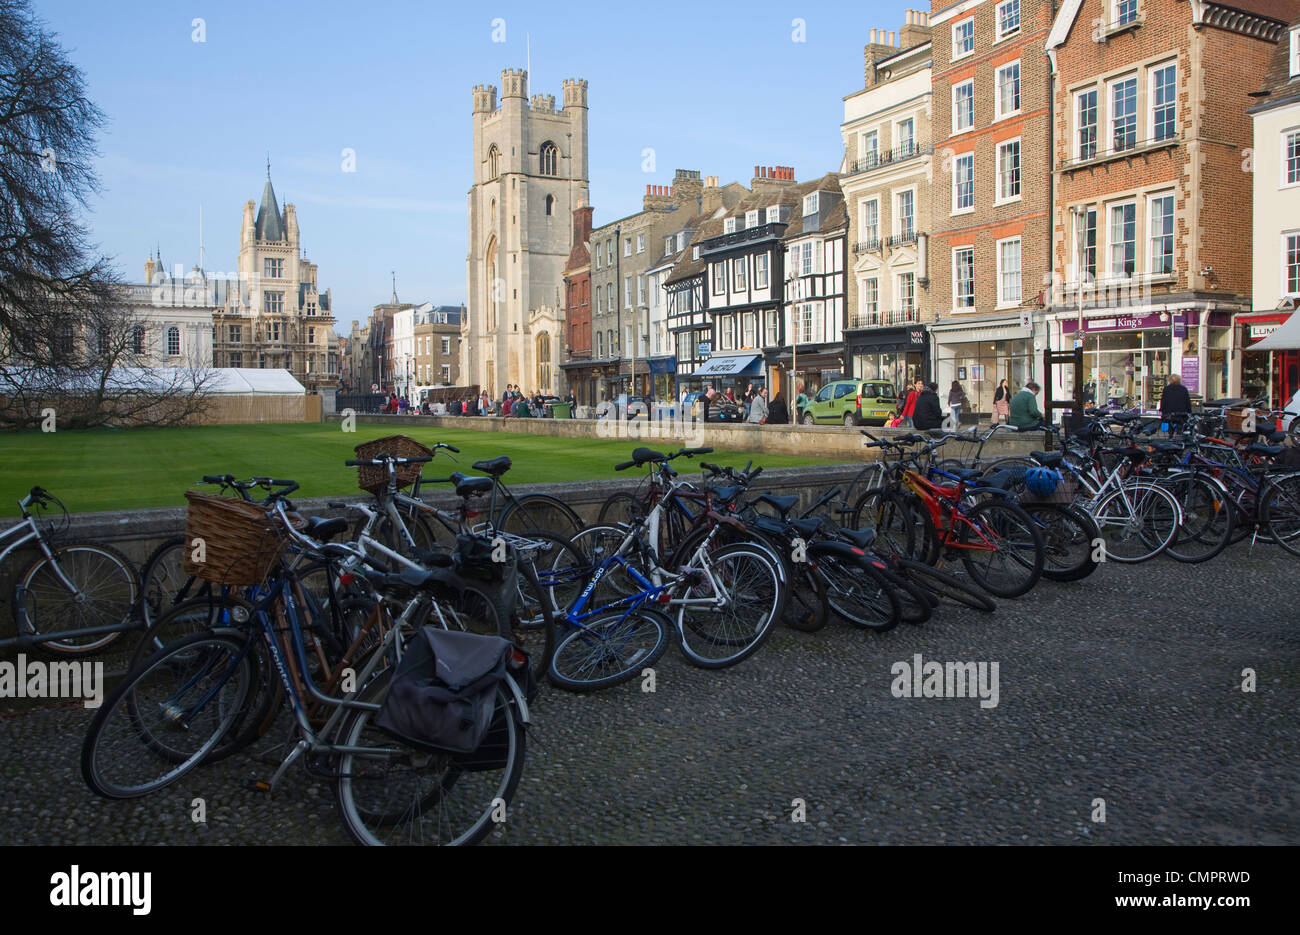 View of King's Parade, Cambridge, England - Stock Image